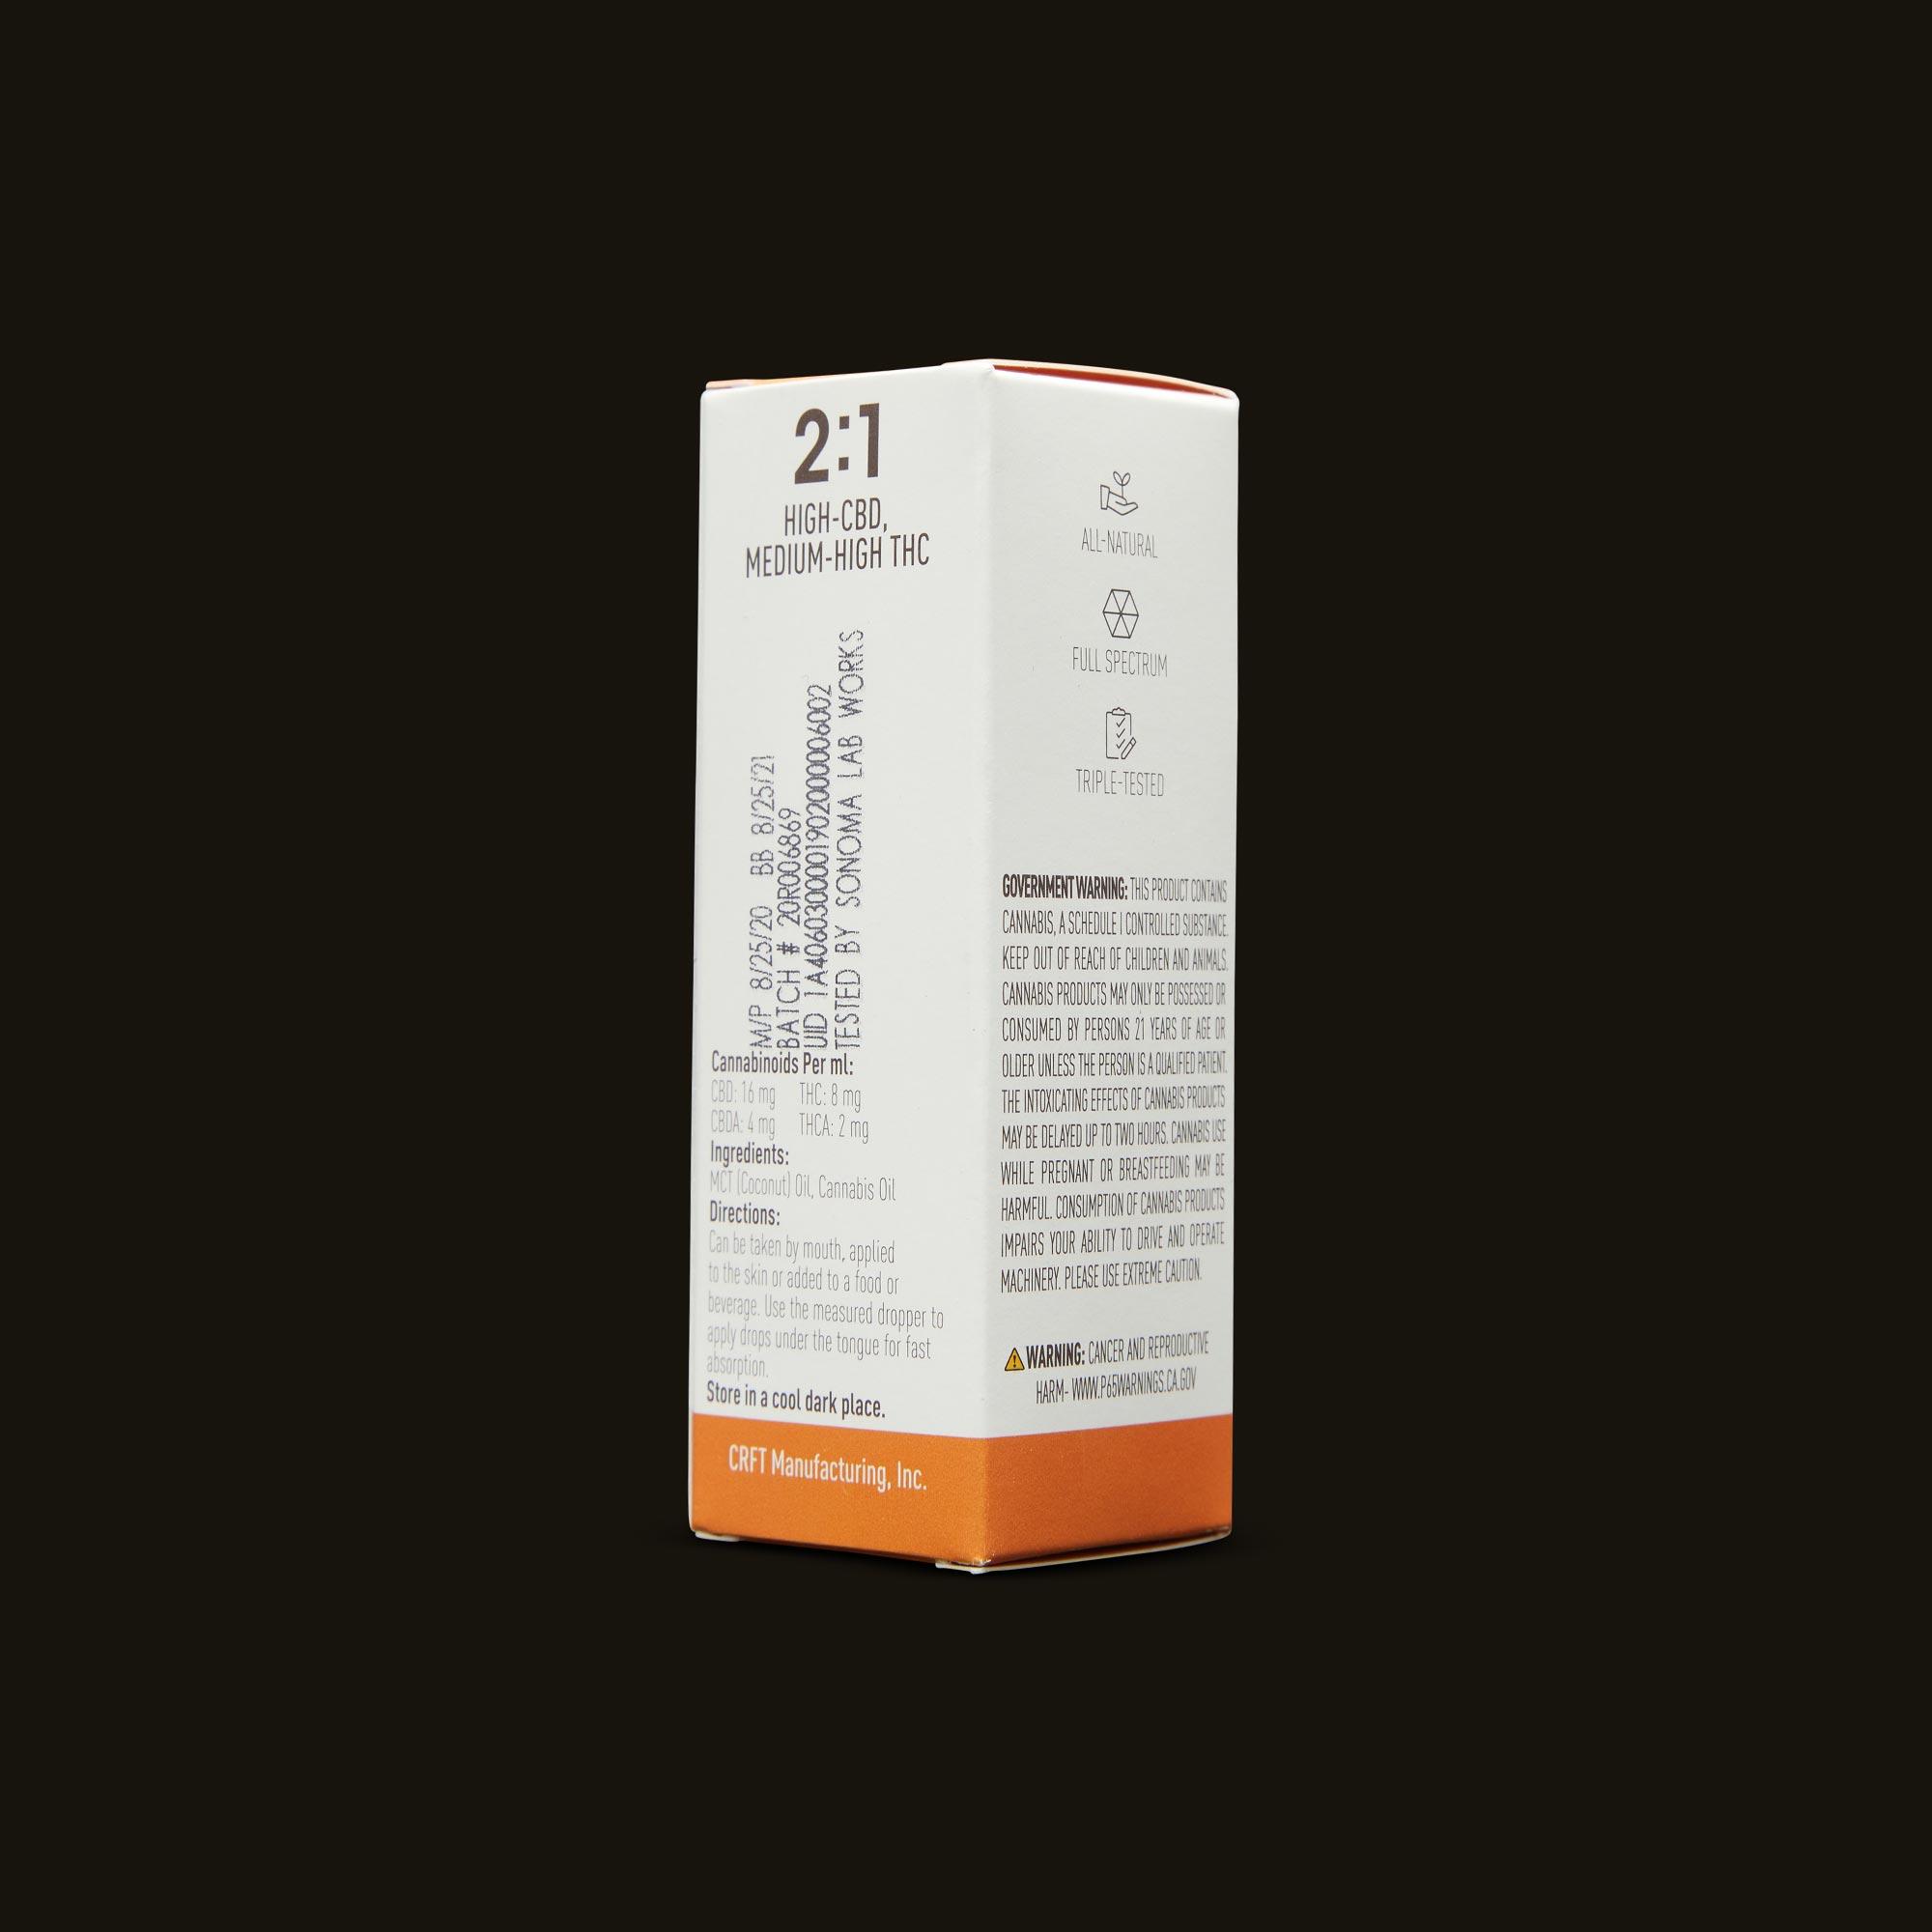 Care By Design 2:1 Full Spectrum CBD Drops - 0.5oz Ingredients